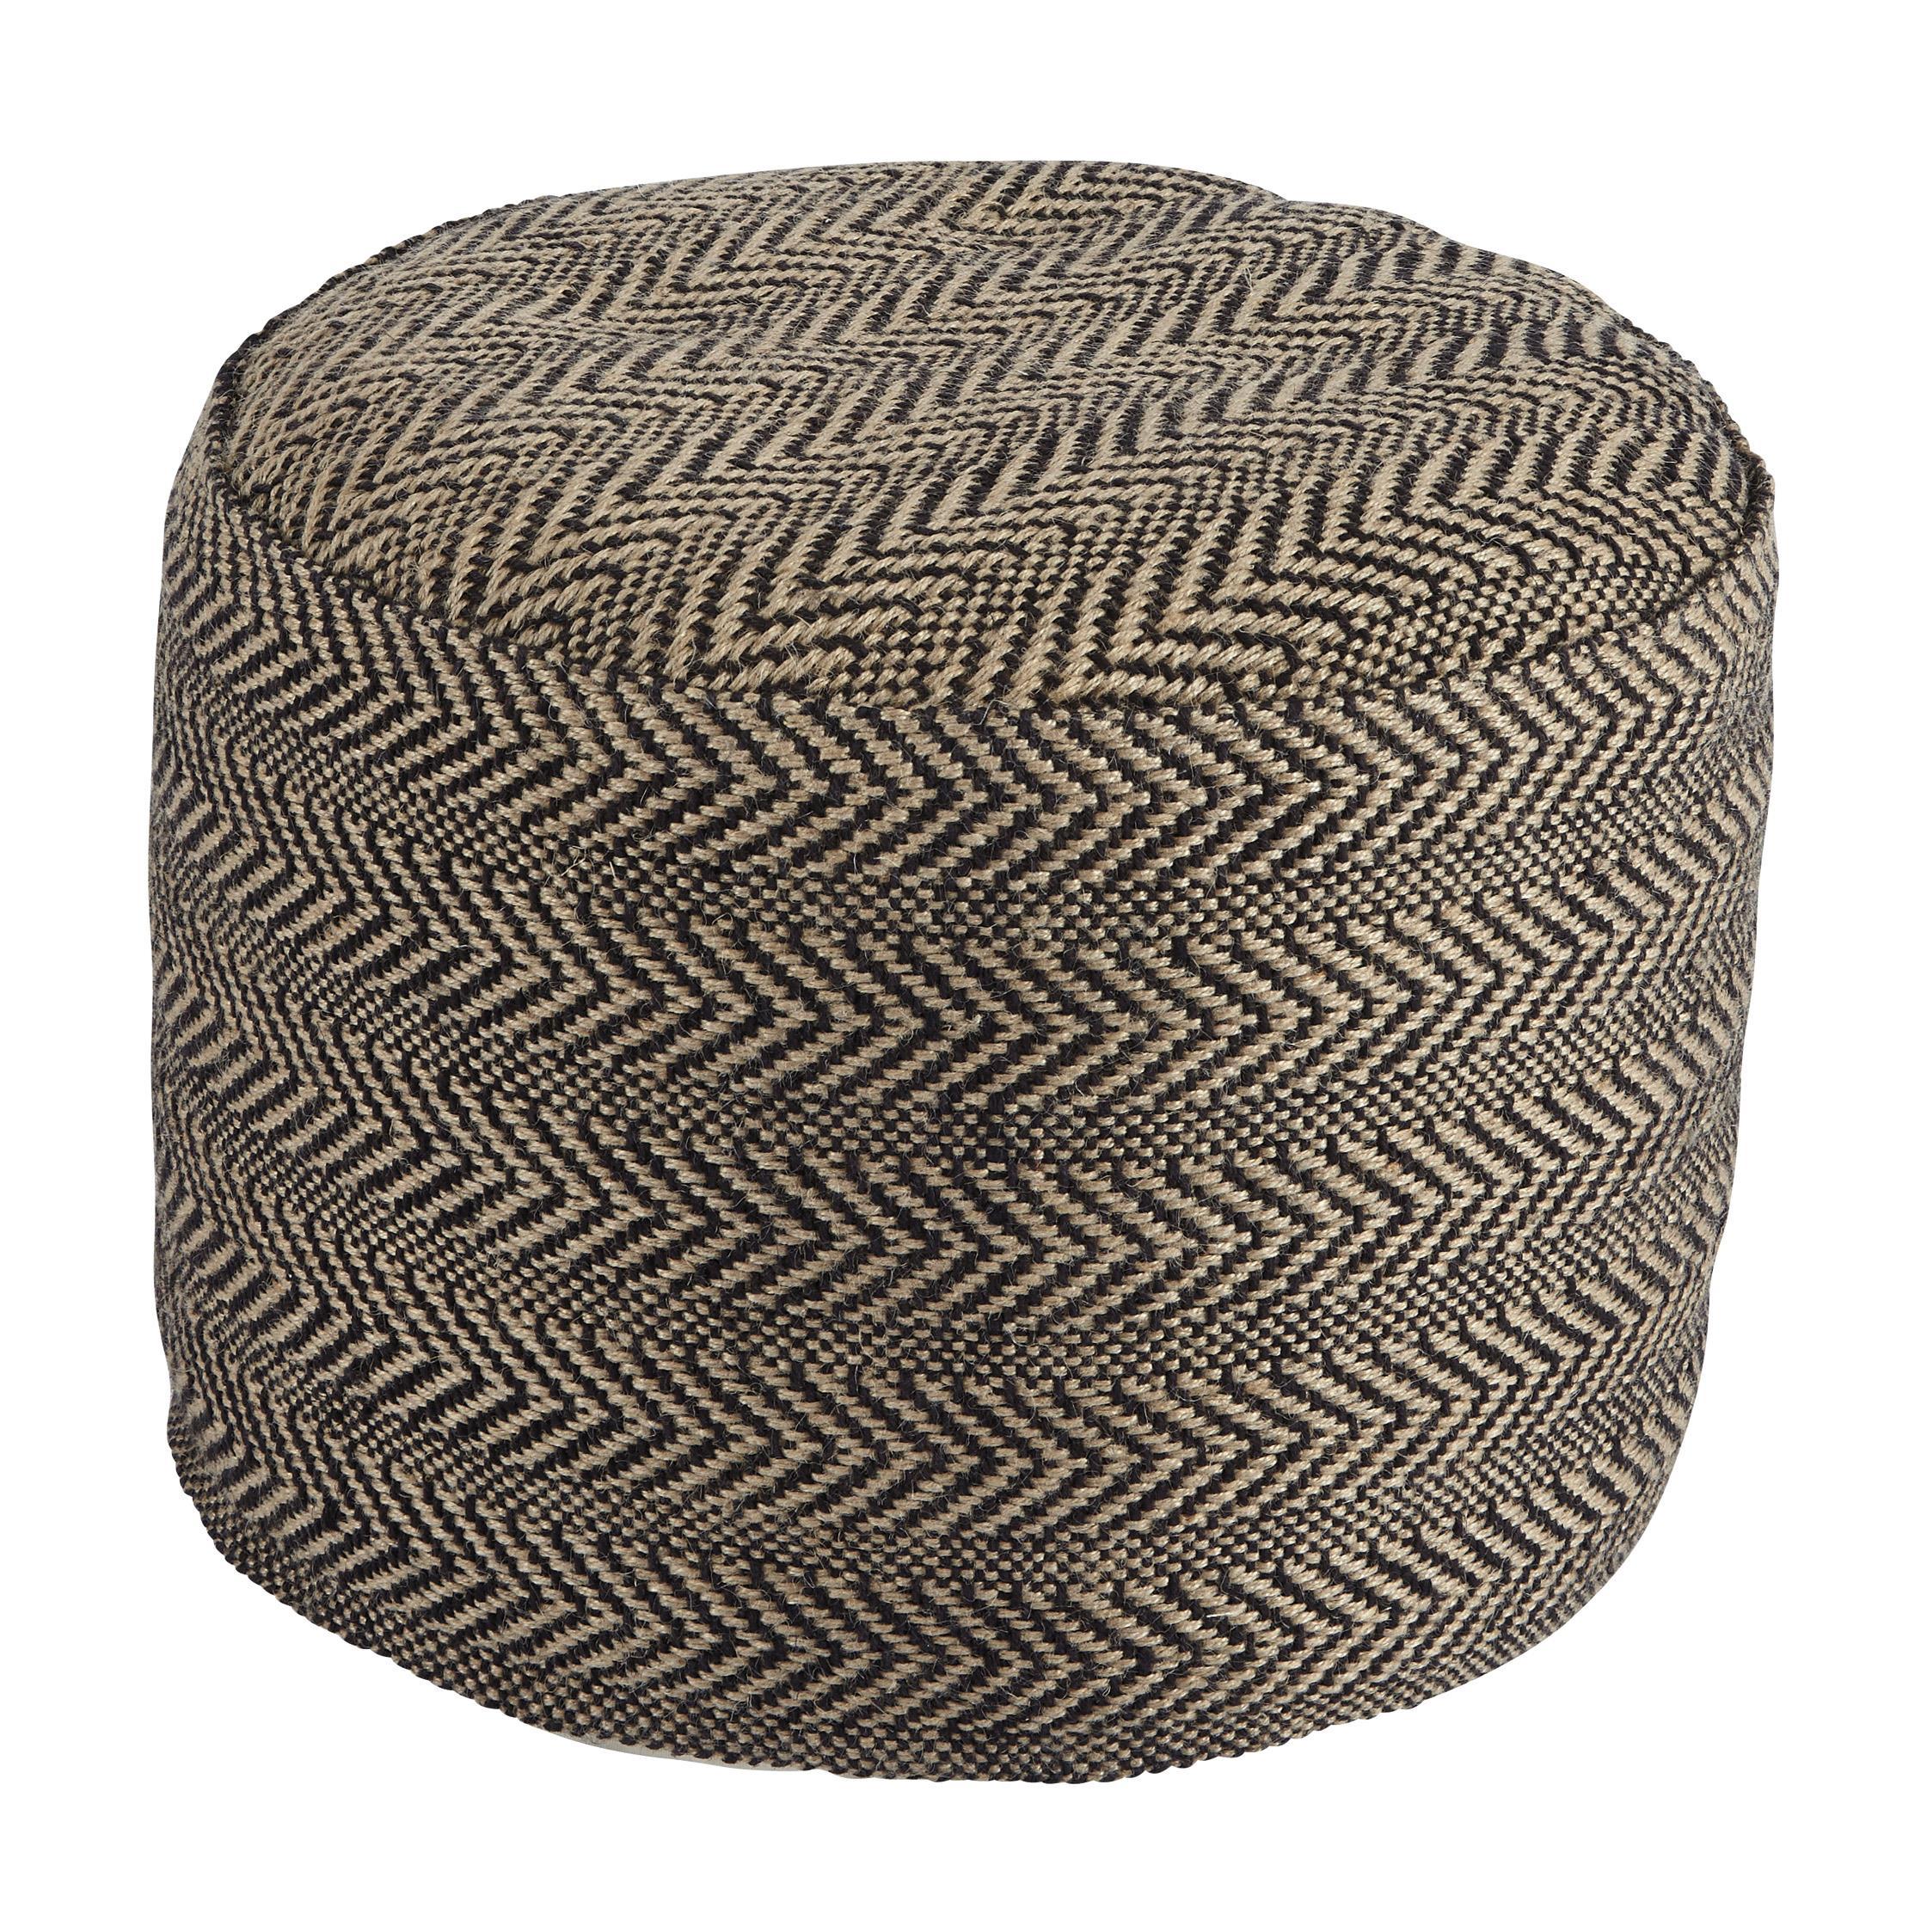 signature design by ashley poufs a1000438 chevron. Black Bedroom Furniture Sets. Home Design Ideas